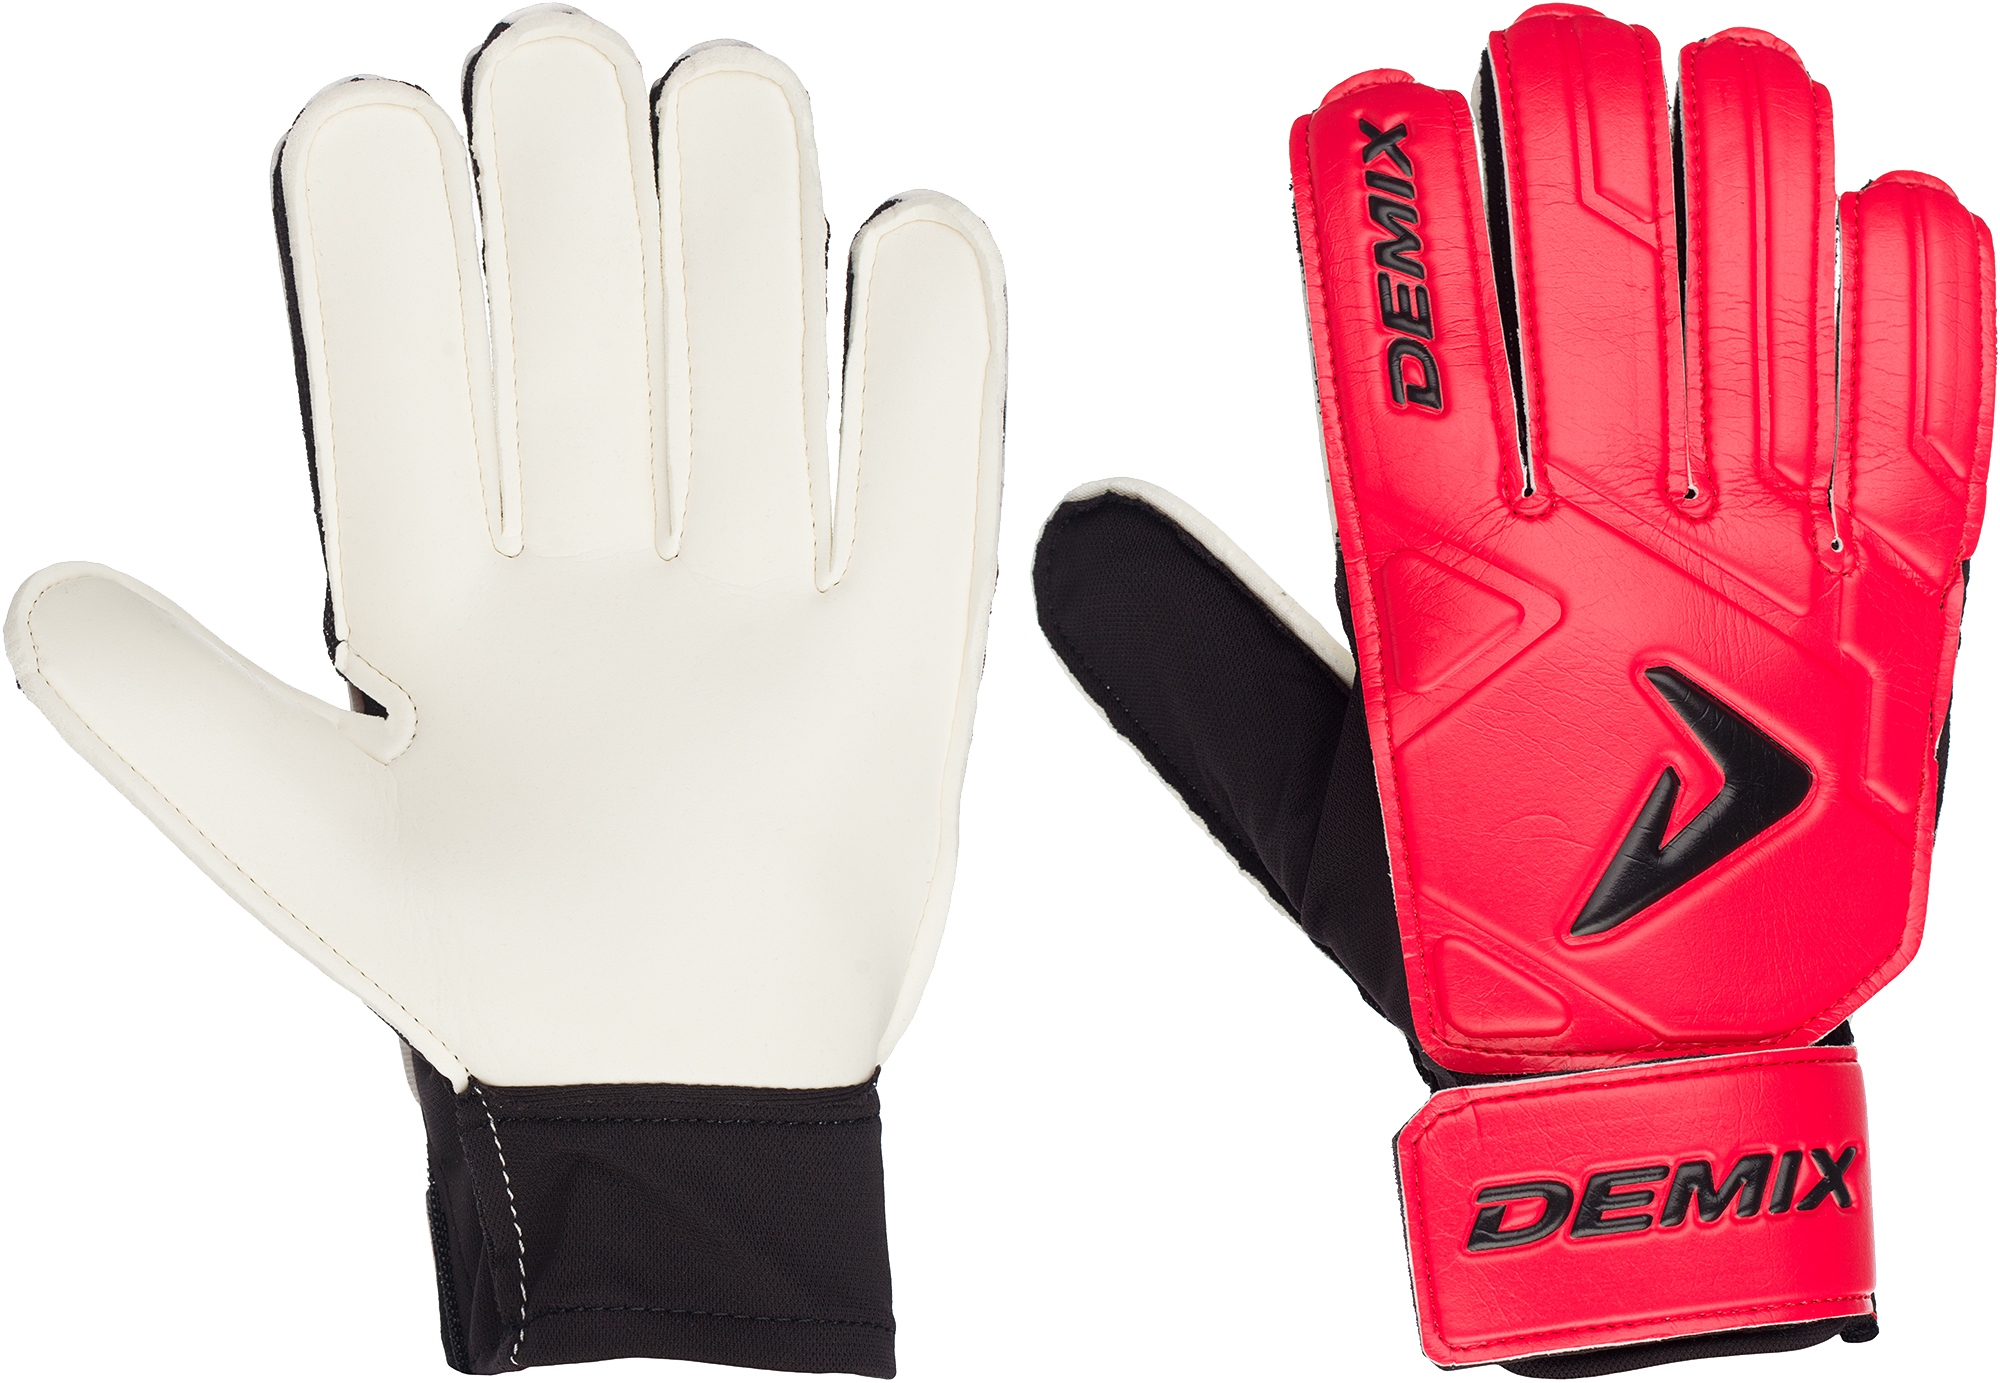 Demix Перчатки вратарские детские Demix, размер 5